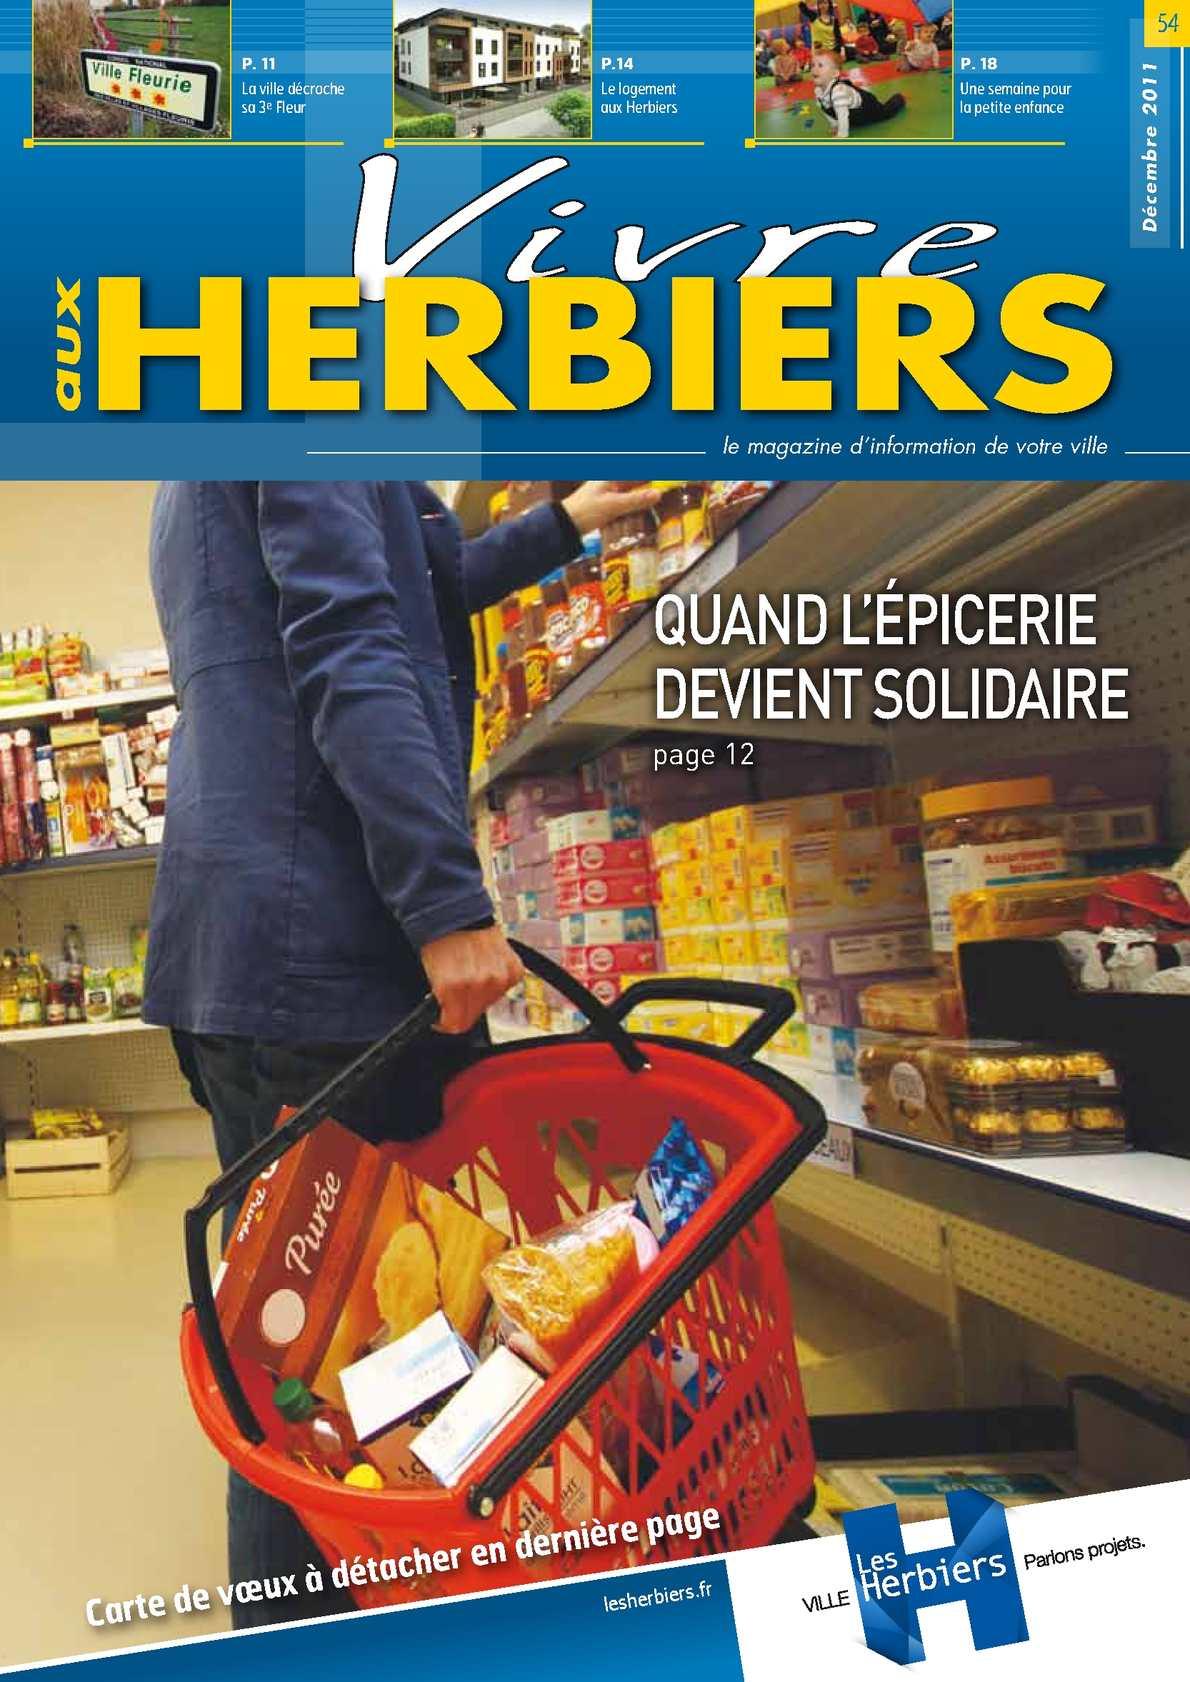 La Valise Rouge Les Herbiers calaméo - vivre aux herbiers n°54